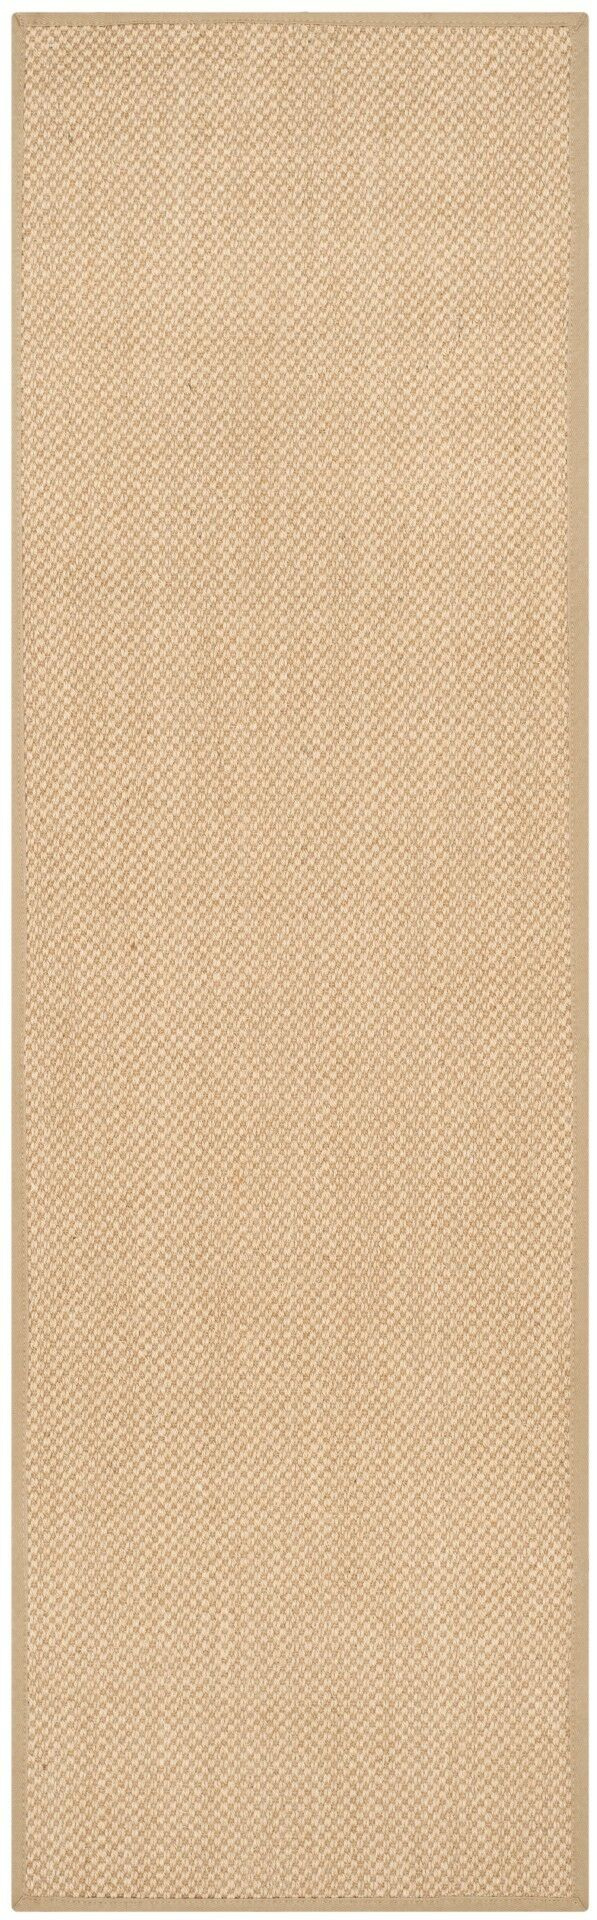 Benevides Maize / Linen Area Rug Rug Size: Runner 2'6